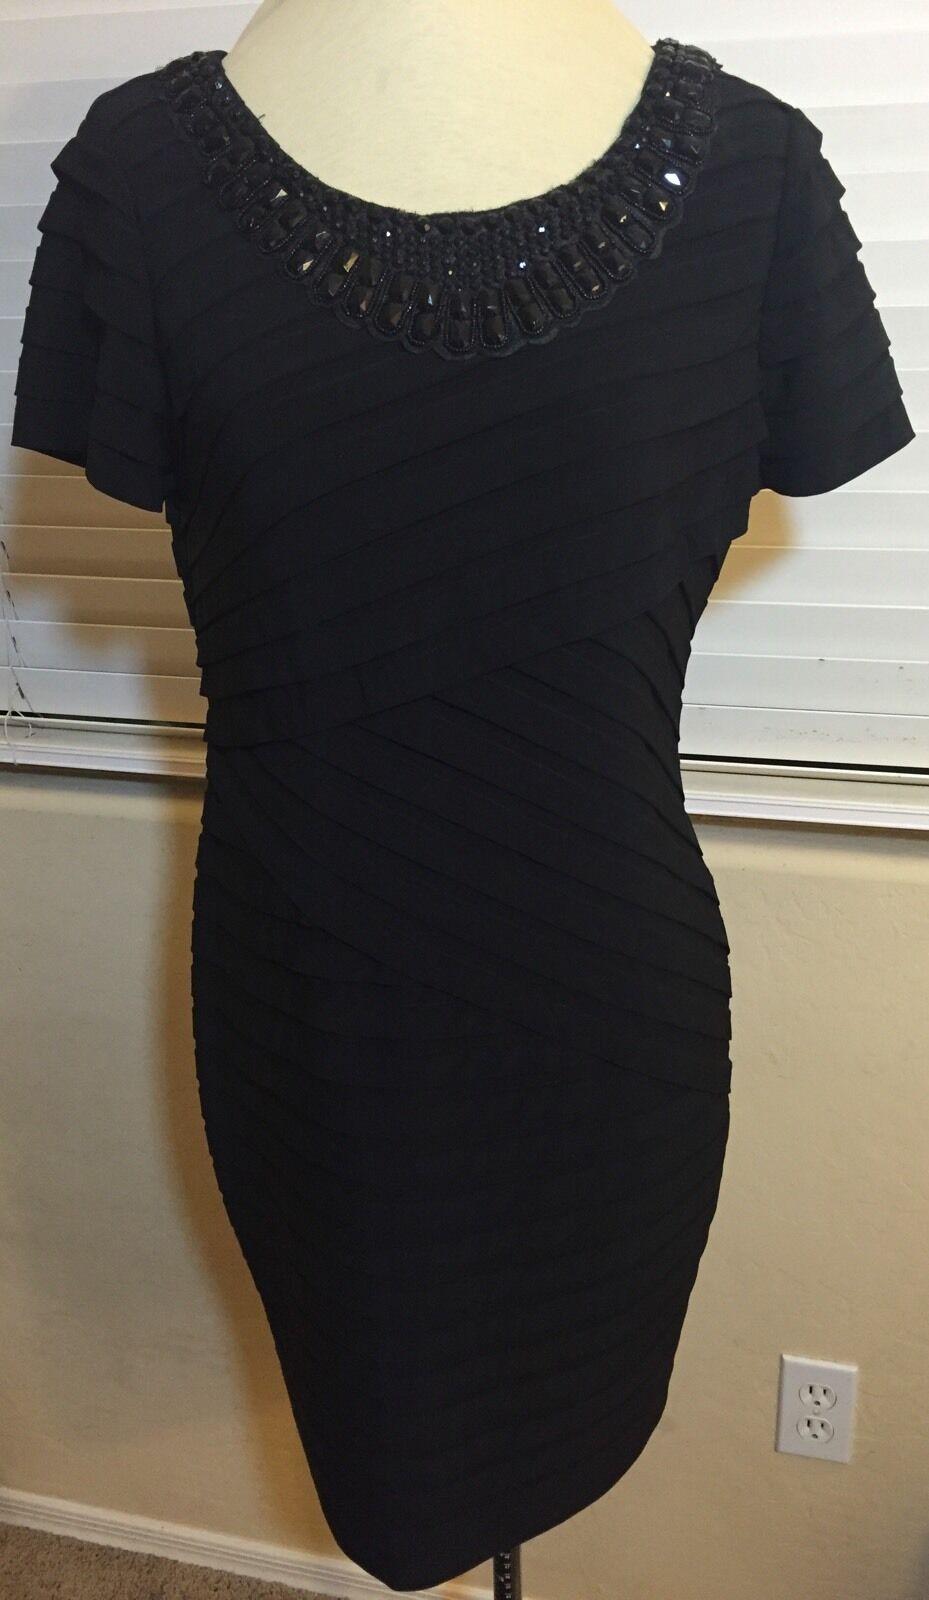 Adrianna Papell Embellished Neck Banded Pleat Sheath Dress  schwarz Größe  10P